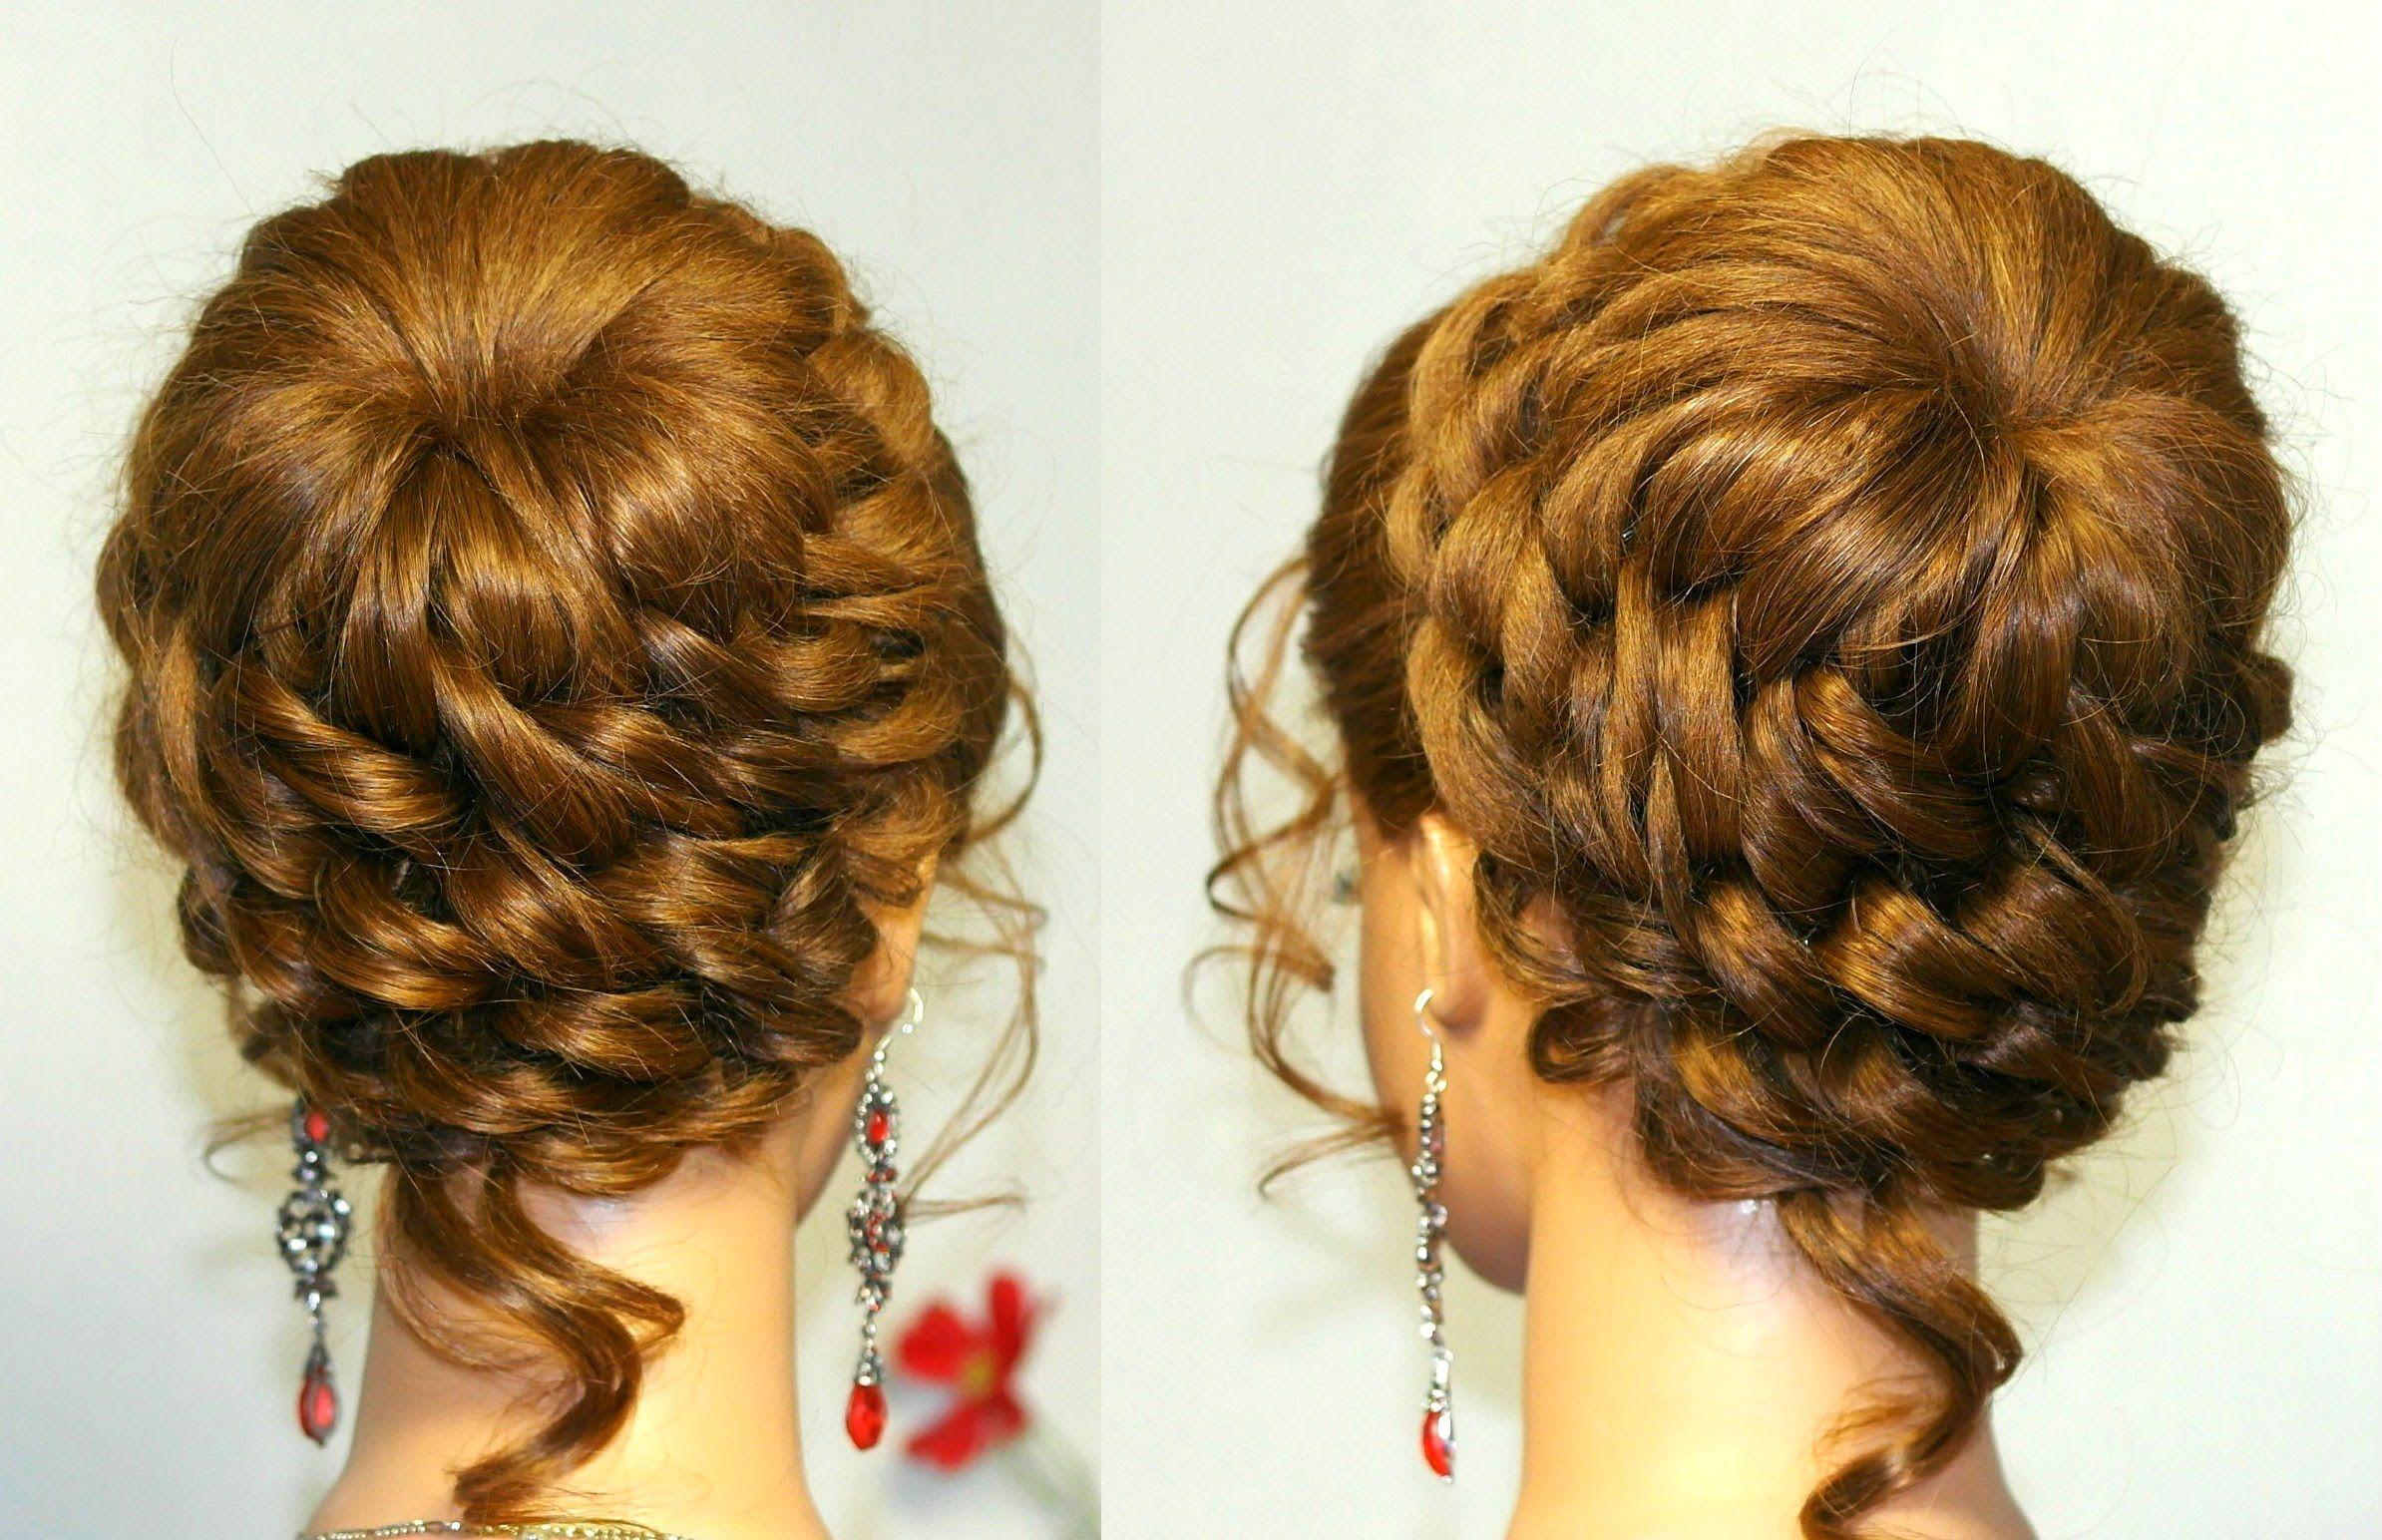 Hairstyles for long hair updo hairstyles Прическа дРя дРинных